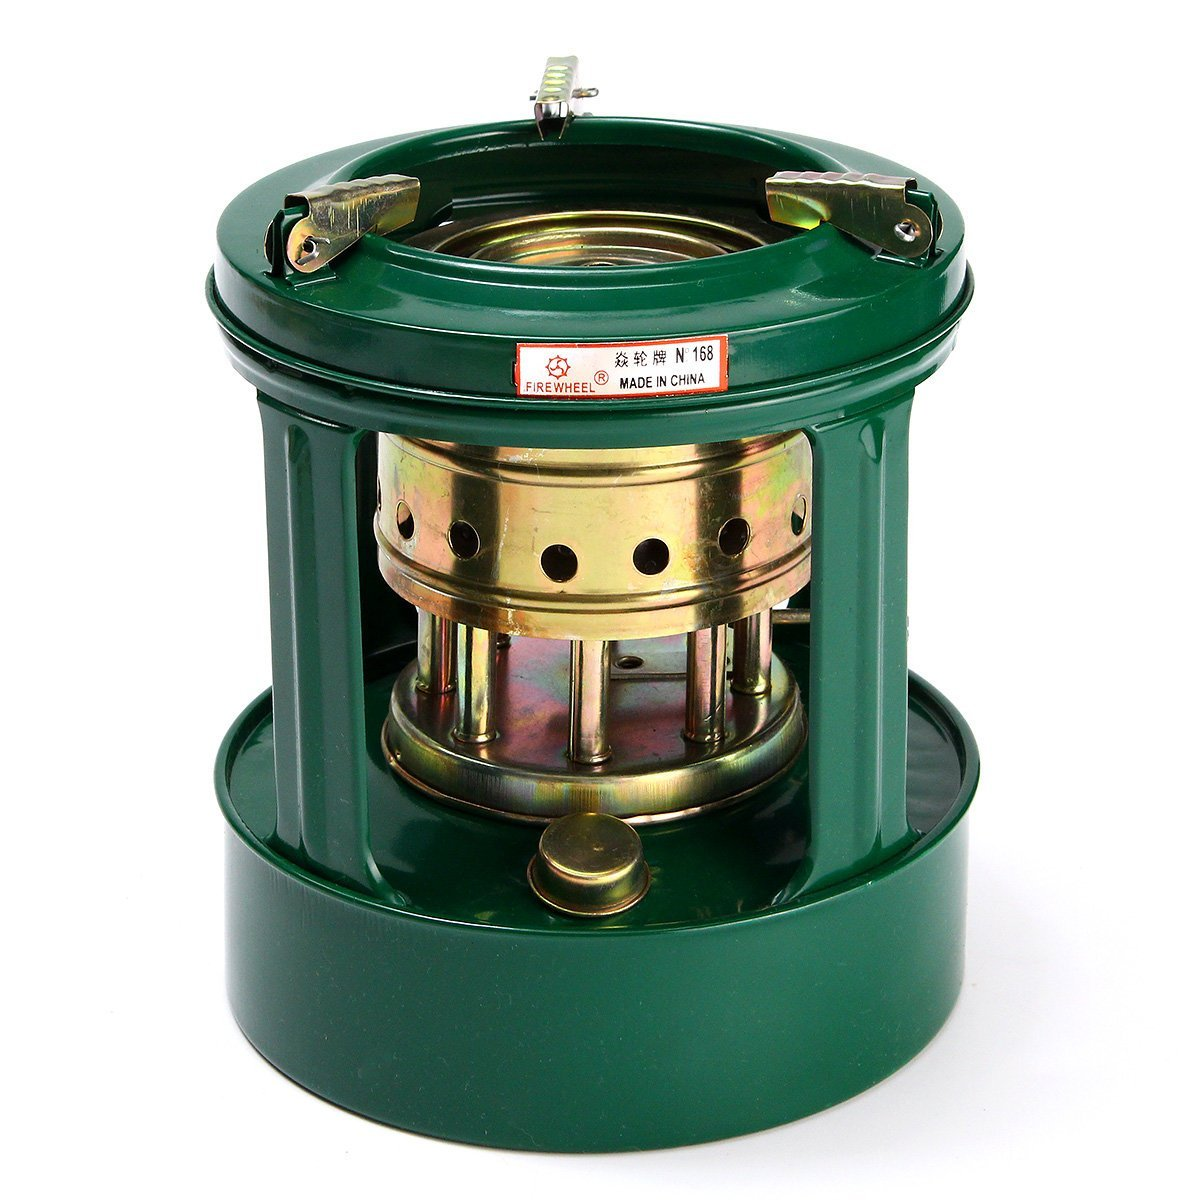 (Ship from US) Outdoor Portable Kerosene Stove 8 Wicks Camping Picnic Burner Furnace Oil stove Heater Cooker